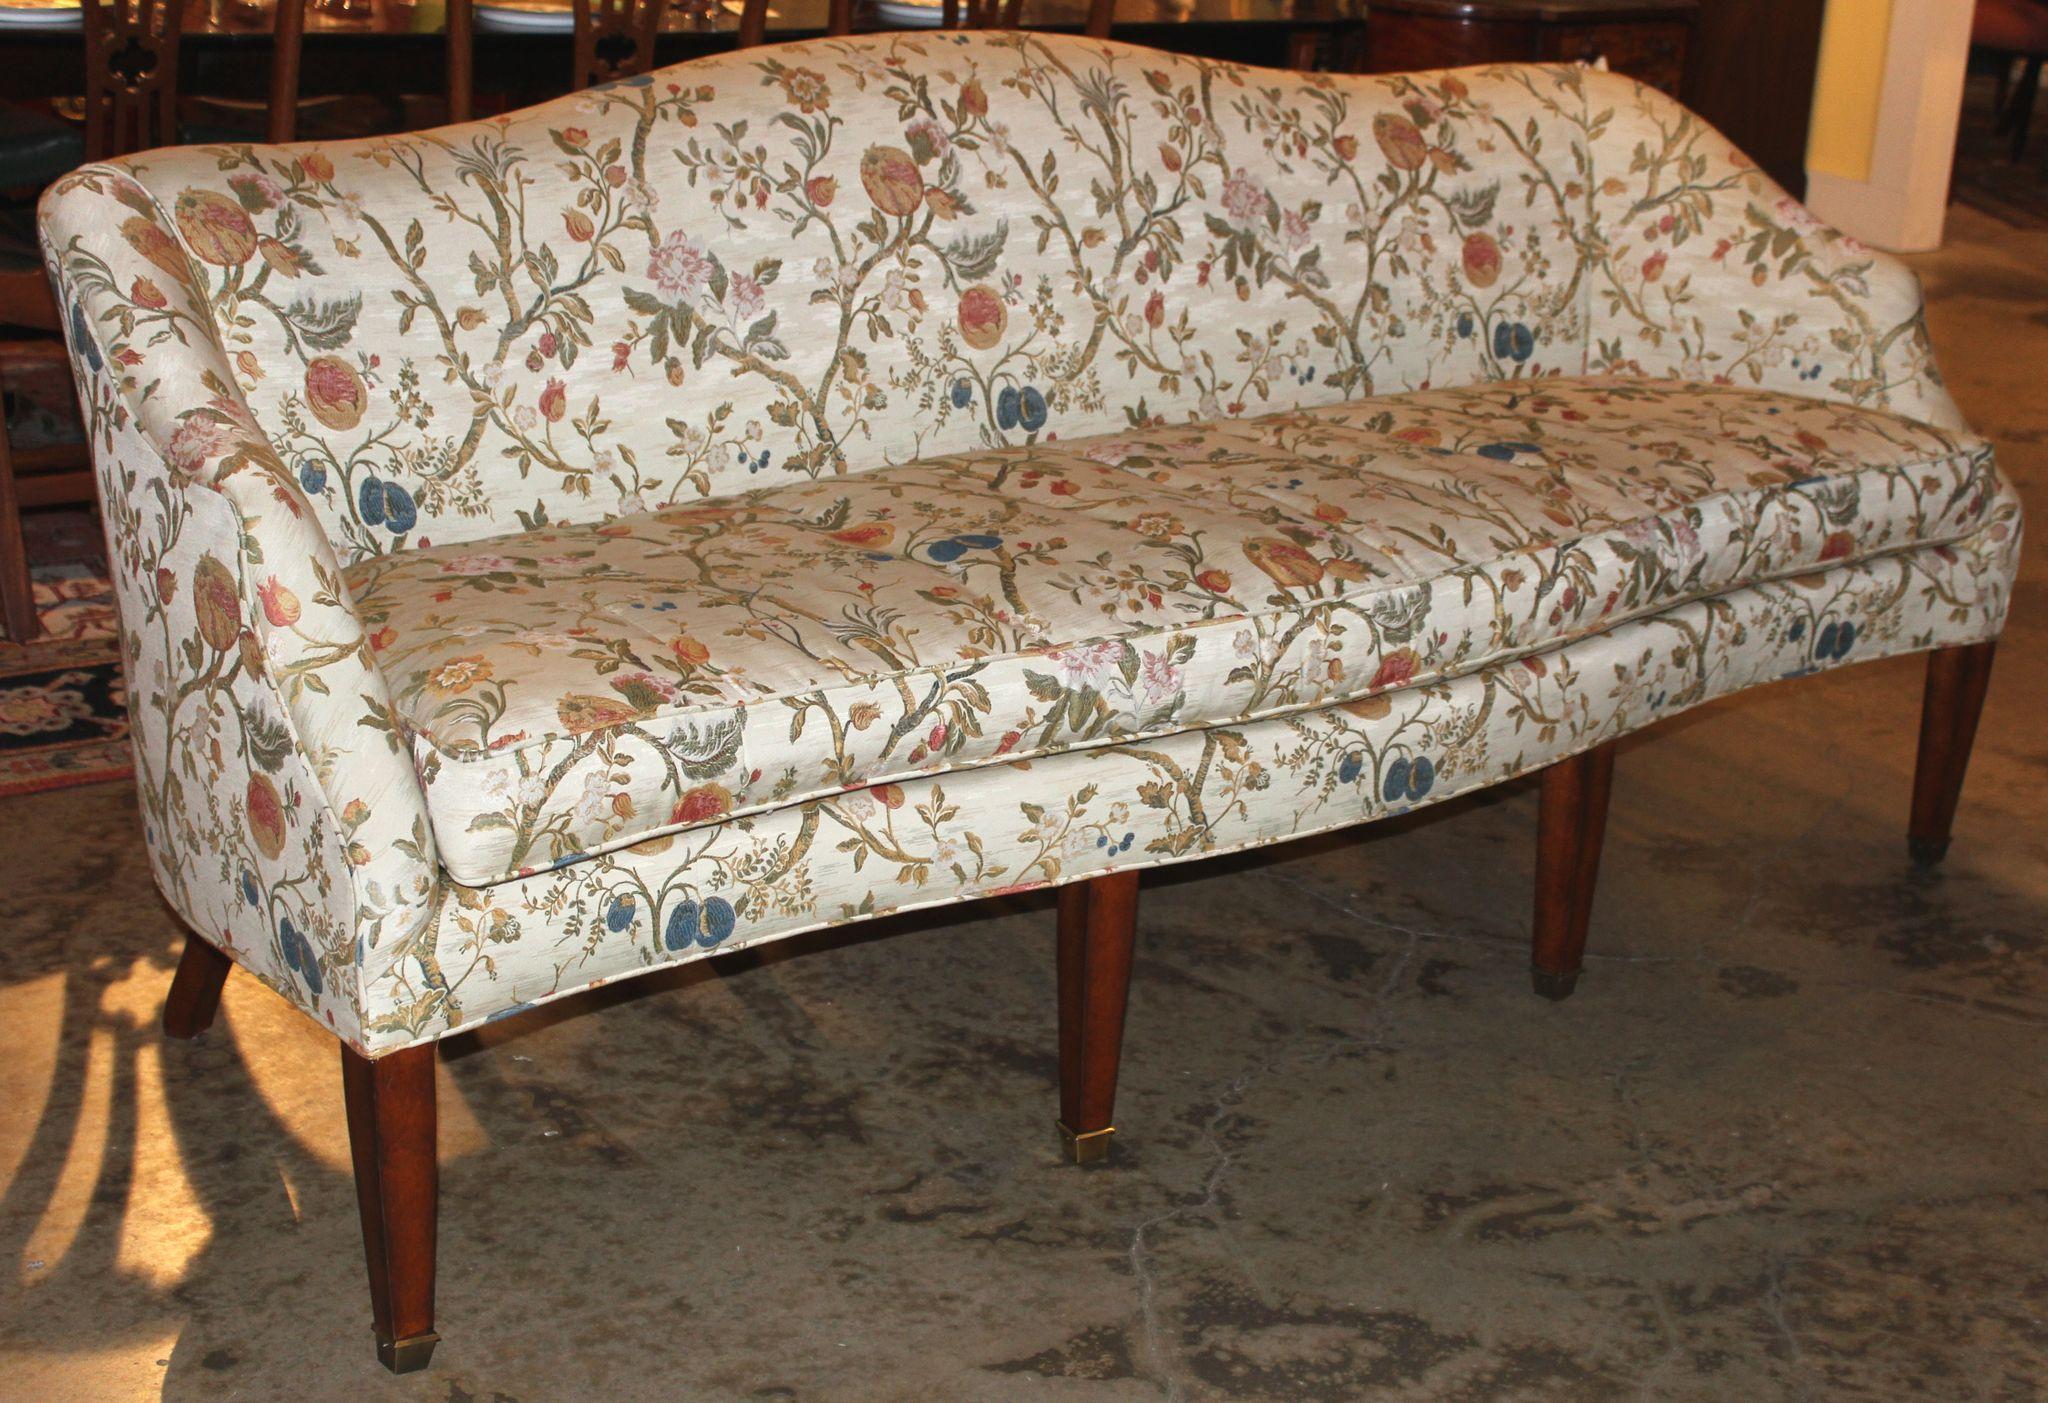 Hepplewhite Sofa Refil Sofa : 47870L from forexrefiller.com size 2048 x 1403 jpeg 414kB